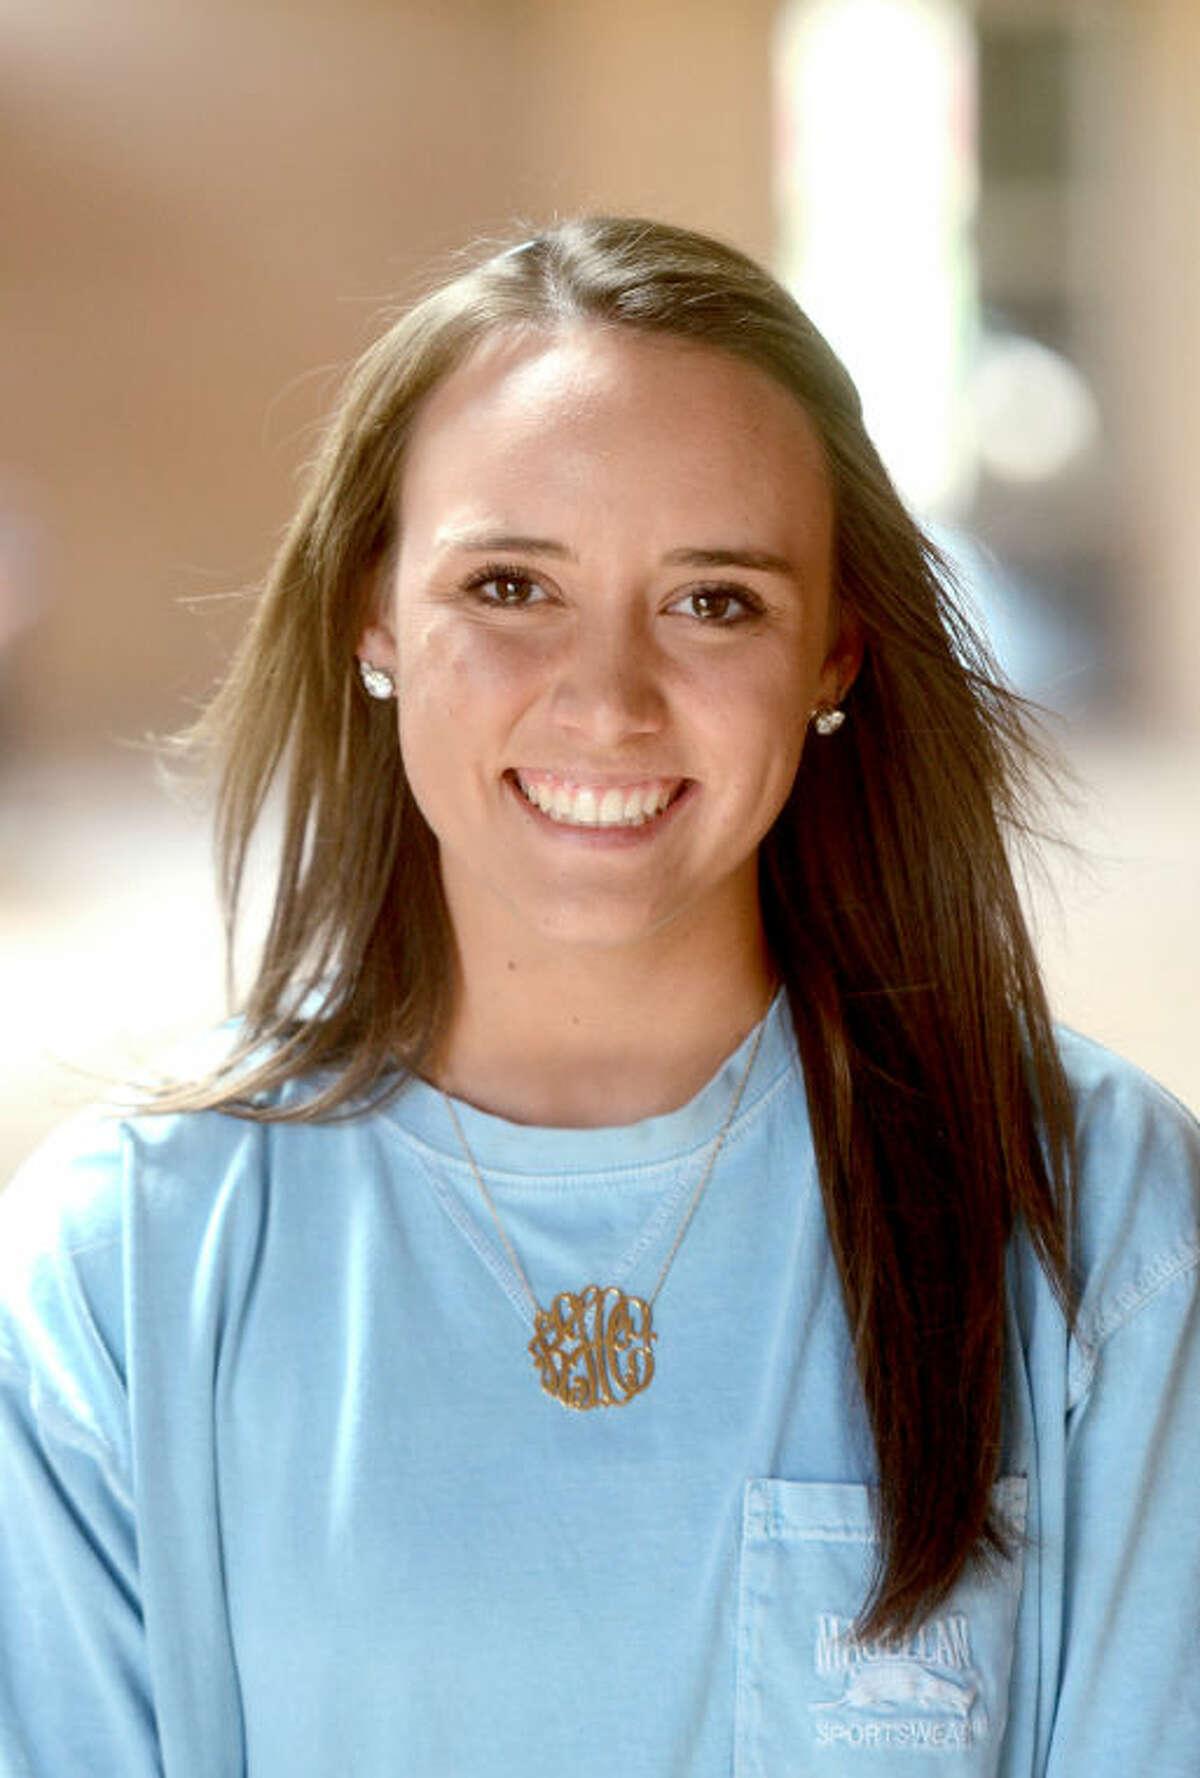 Kaitlin Hendrick of Odessa is the senior Valedictorian at Trinity School. James Durbin/Reporter-Telegram